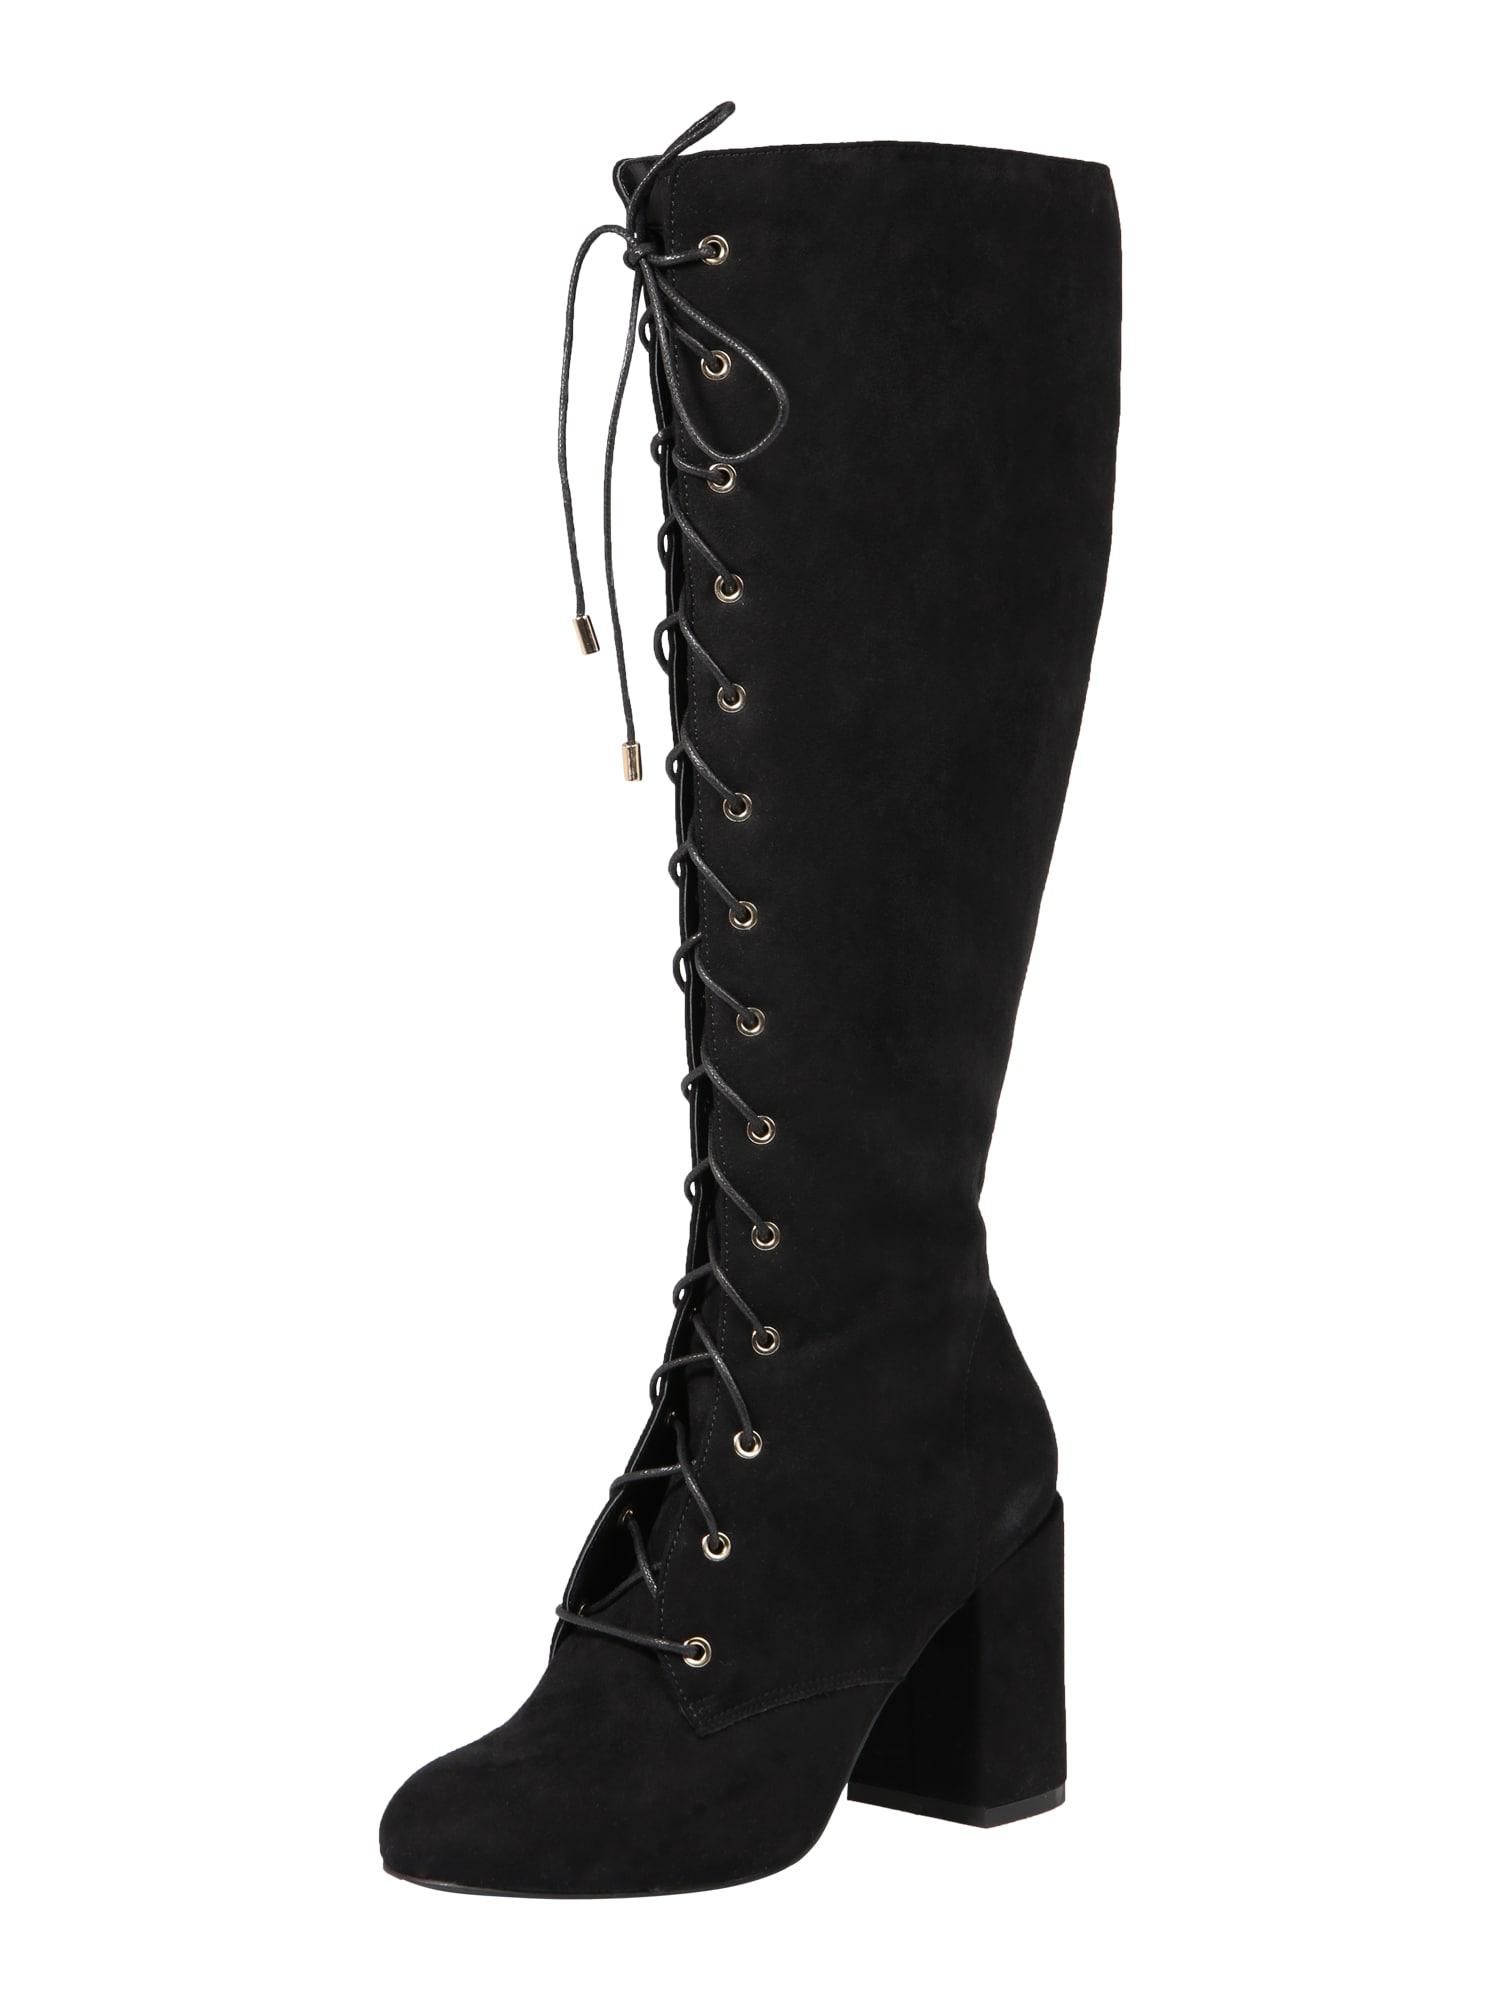 ABOUT YOU Auliniai batai su kulniuku 'Femke' juoda